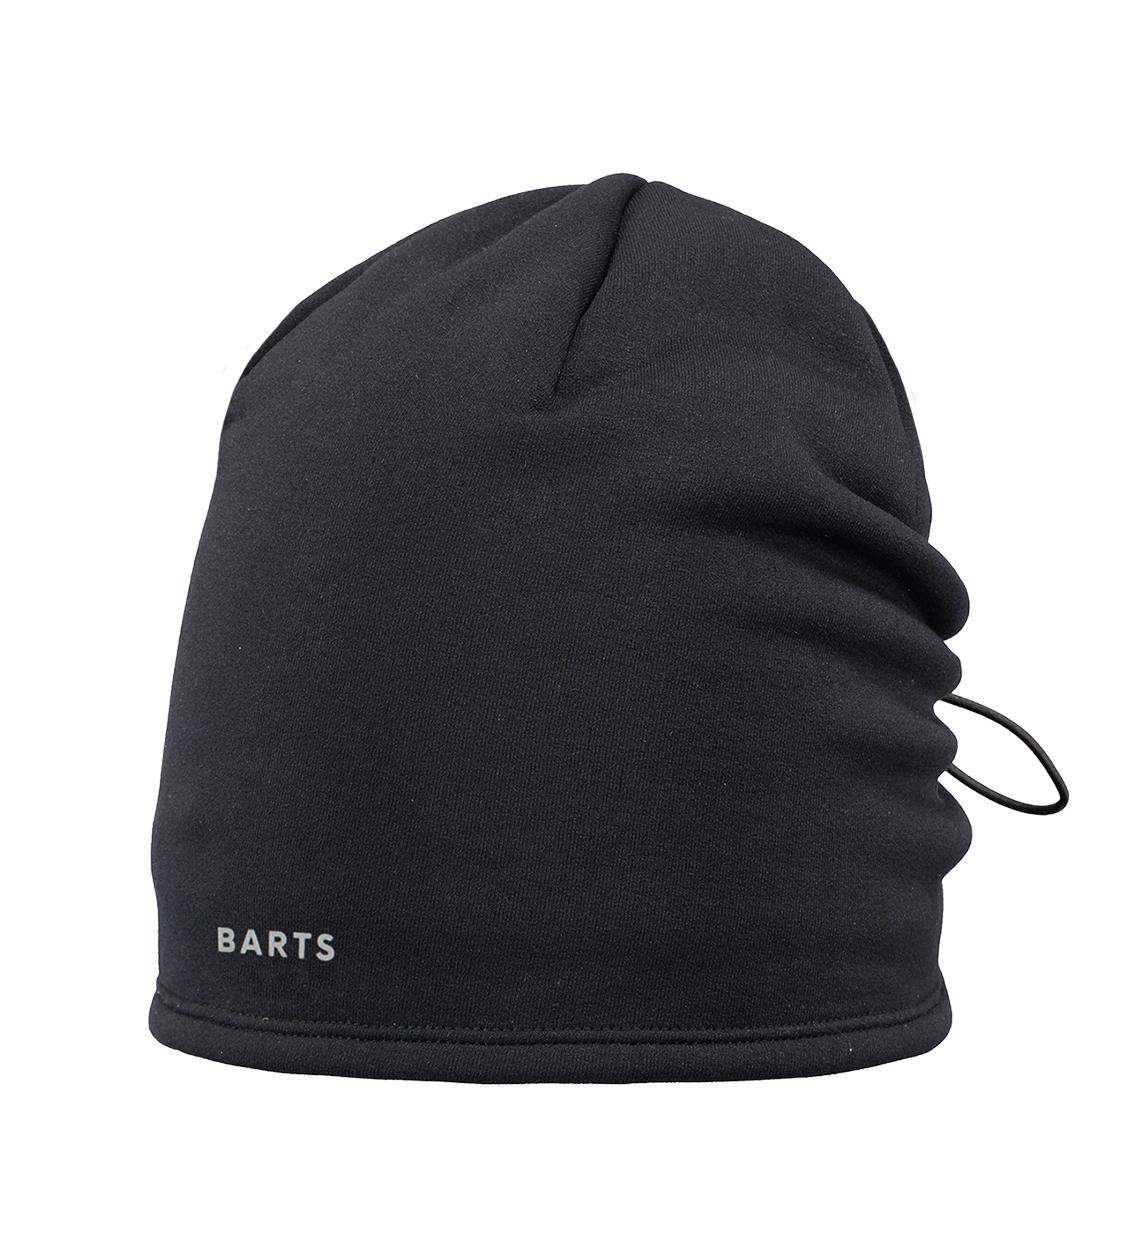 Barts Running Hat - Bonnet